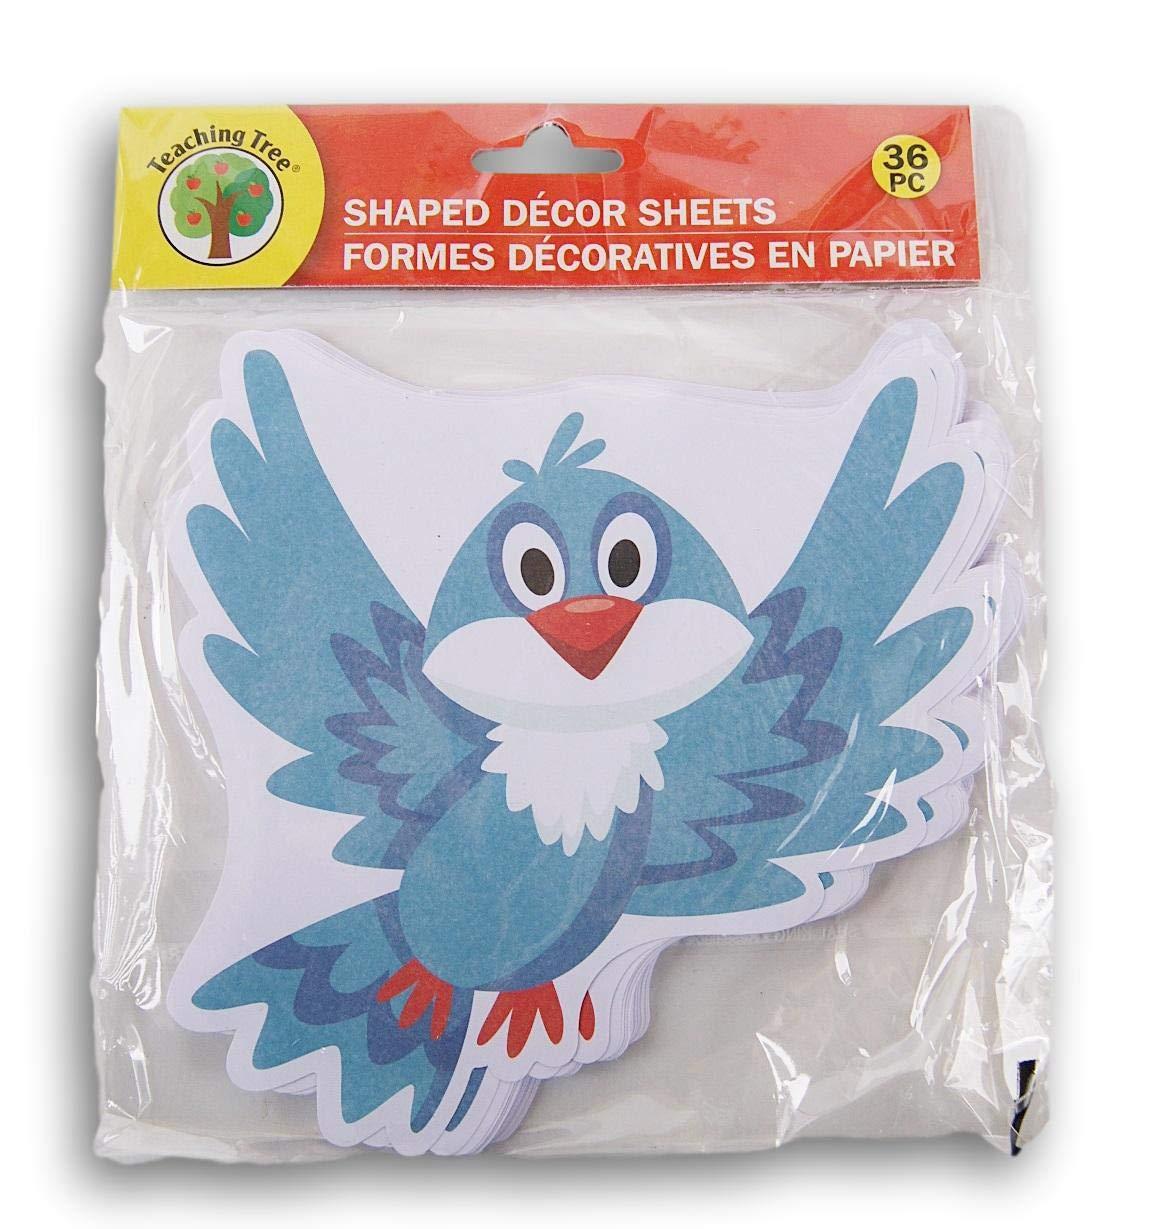 Teaching Tree Paper Shaped Decor Sheets 36 Count Bluebird